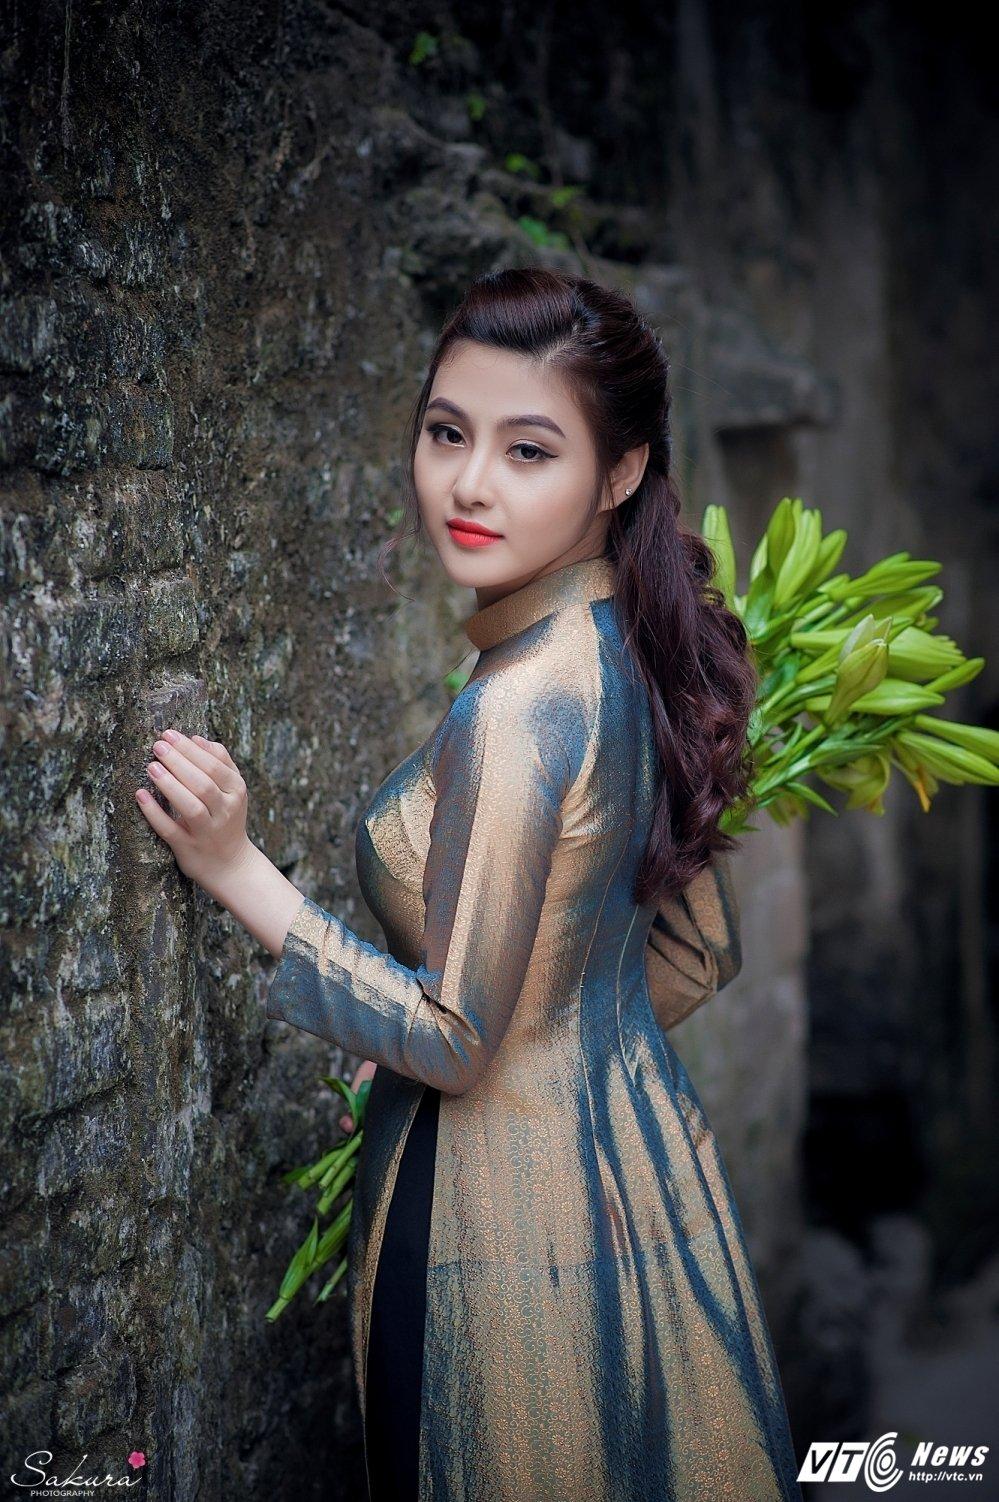 Hot girl xu Thanh xinh dep, khoe dang chuan trong ta ao dai van nguoi me hinh anh 1